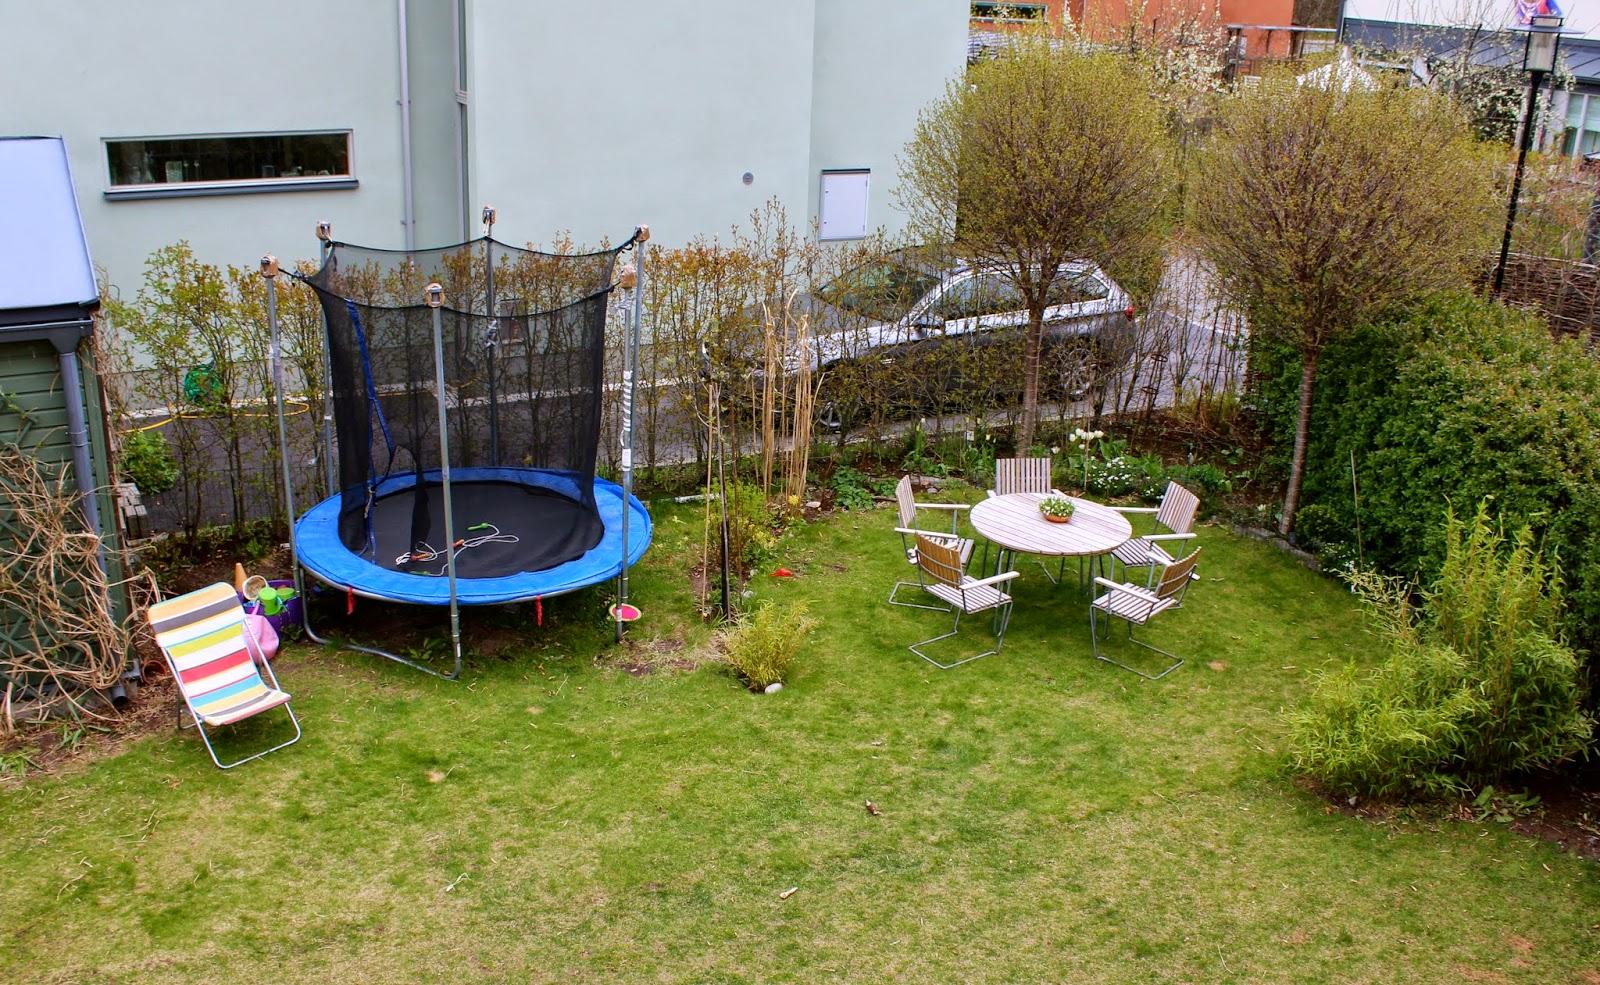 Lotta insideout: trädgårdsdesign   liten tomt i norrläge